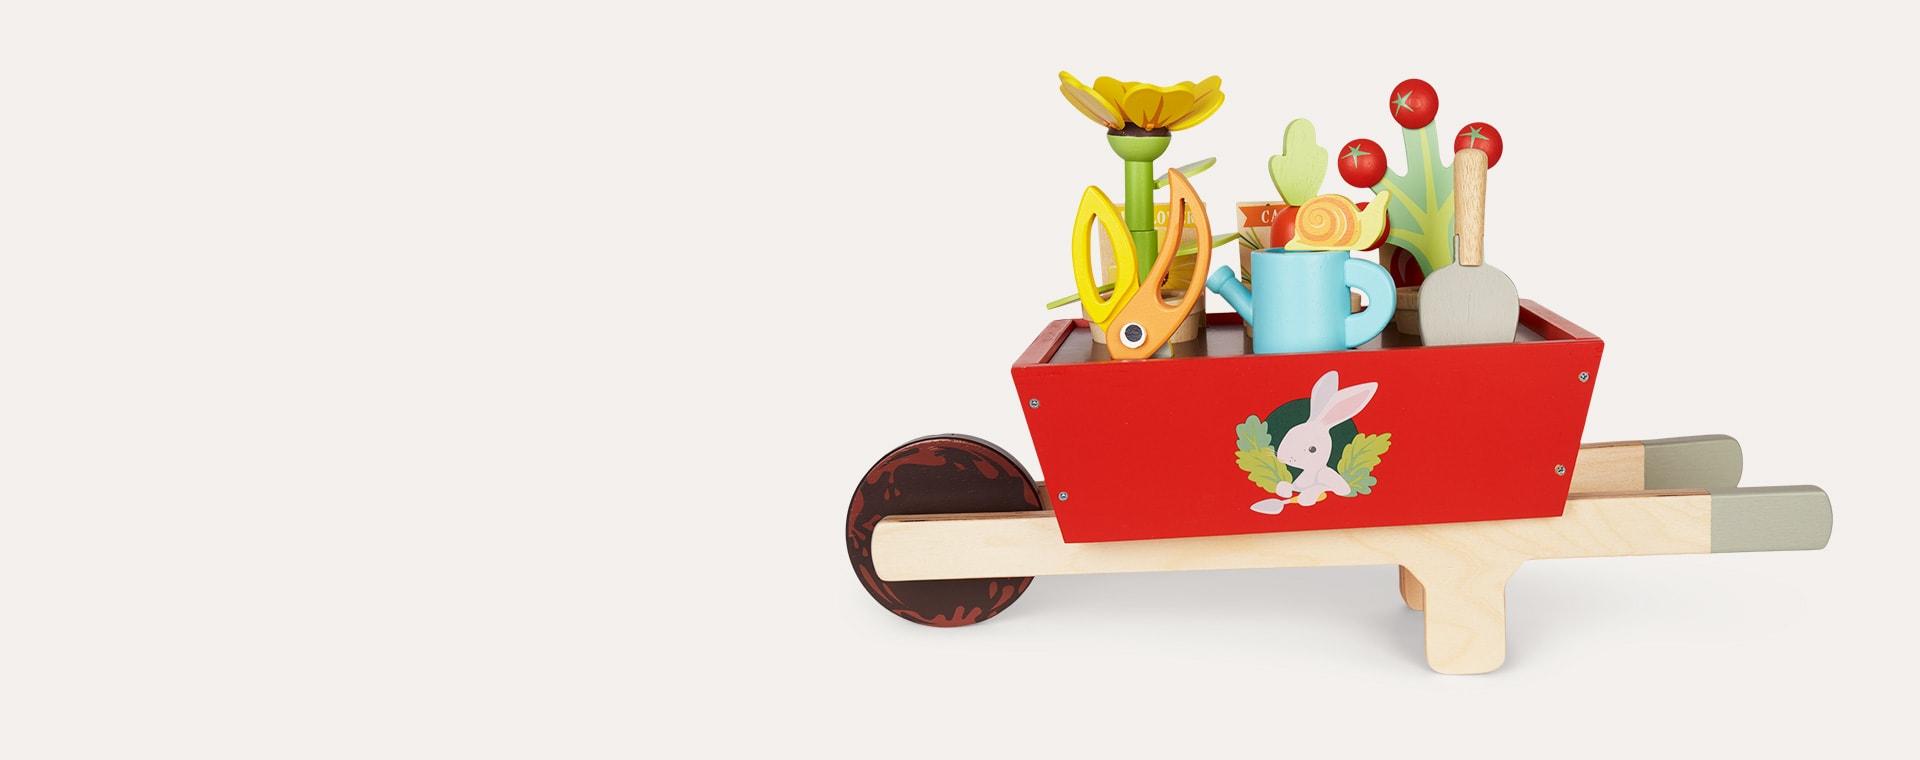 Red Tender Leaf Toys Garden Wheelbarrow Set